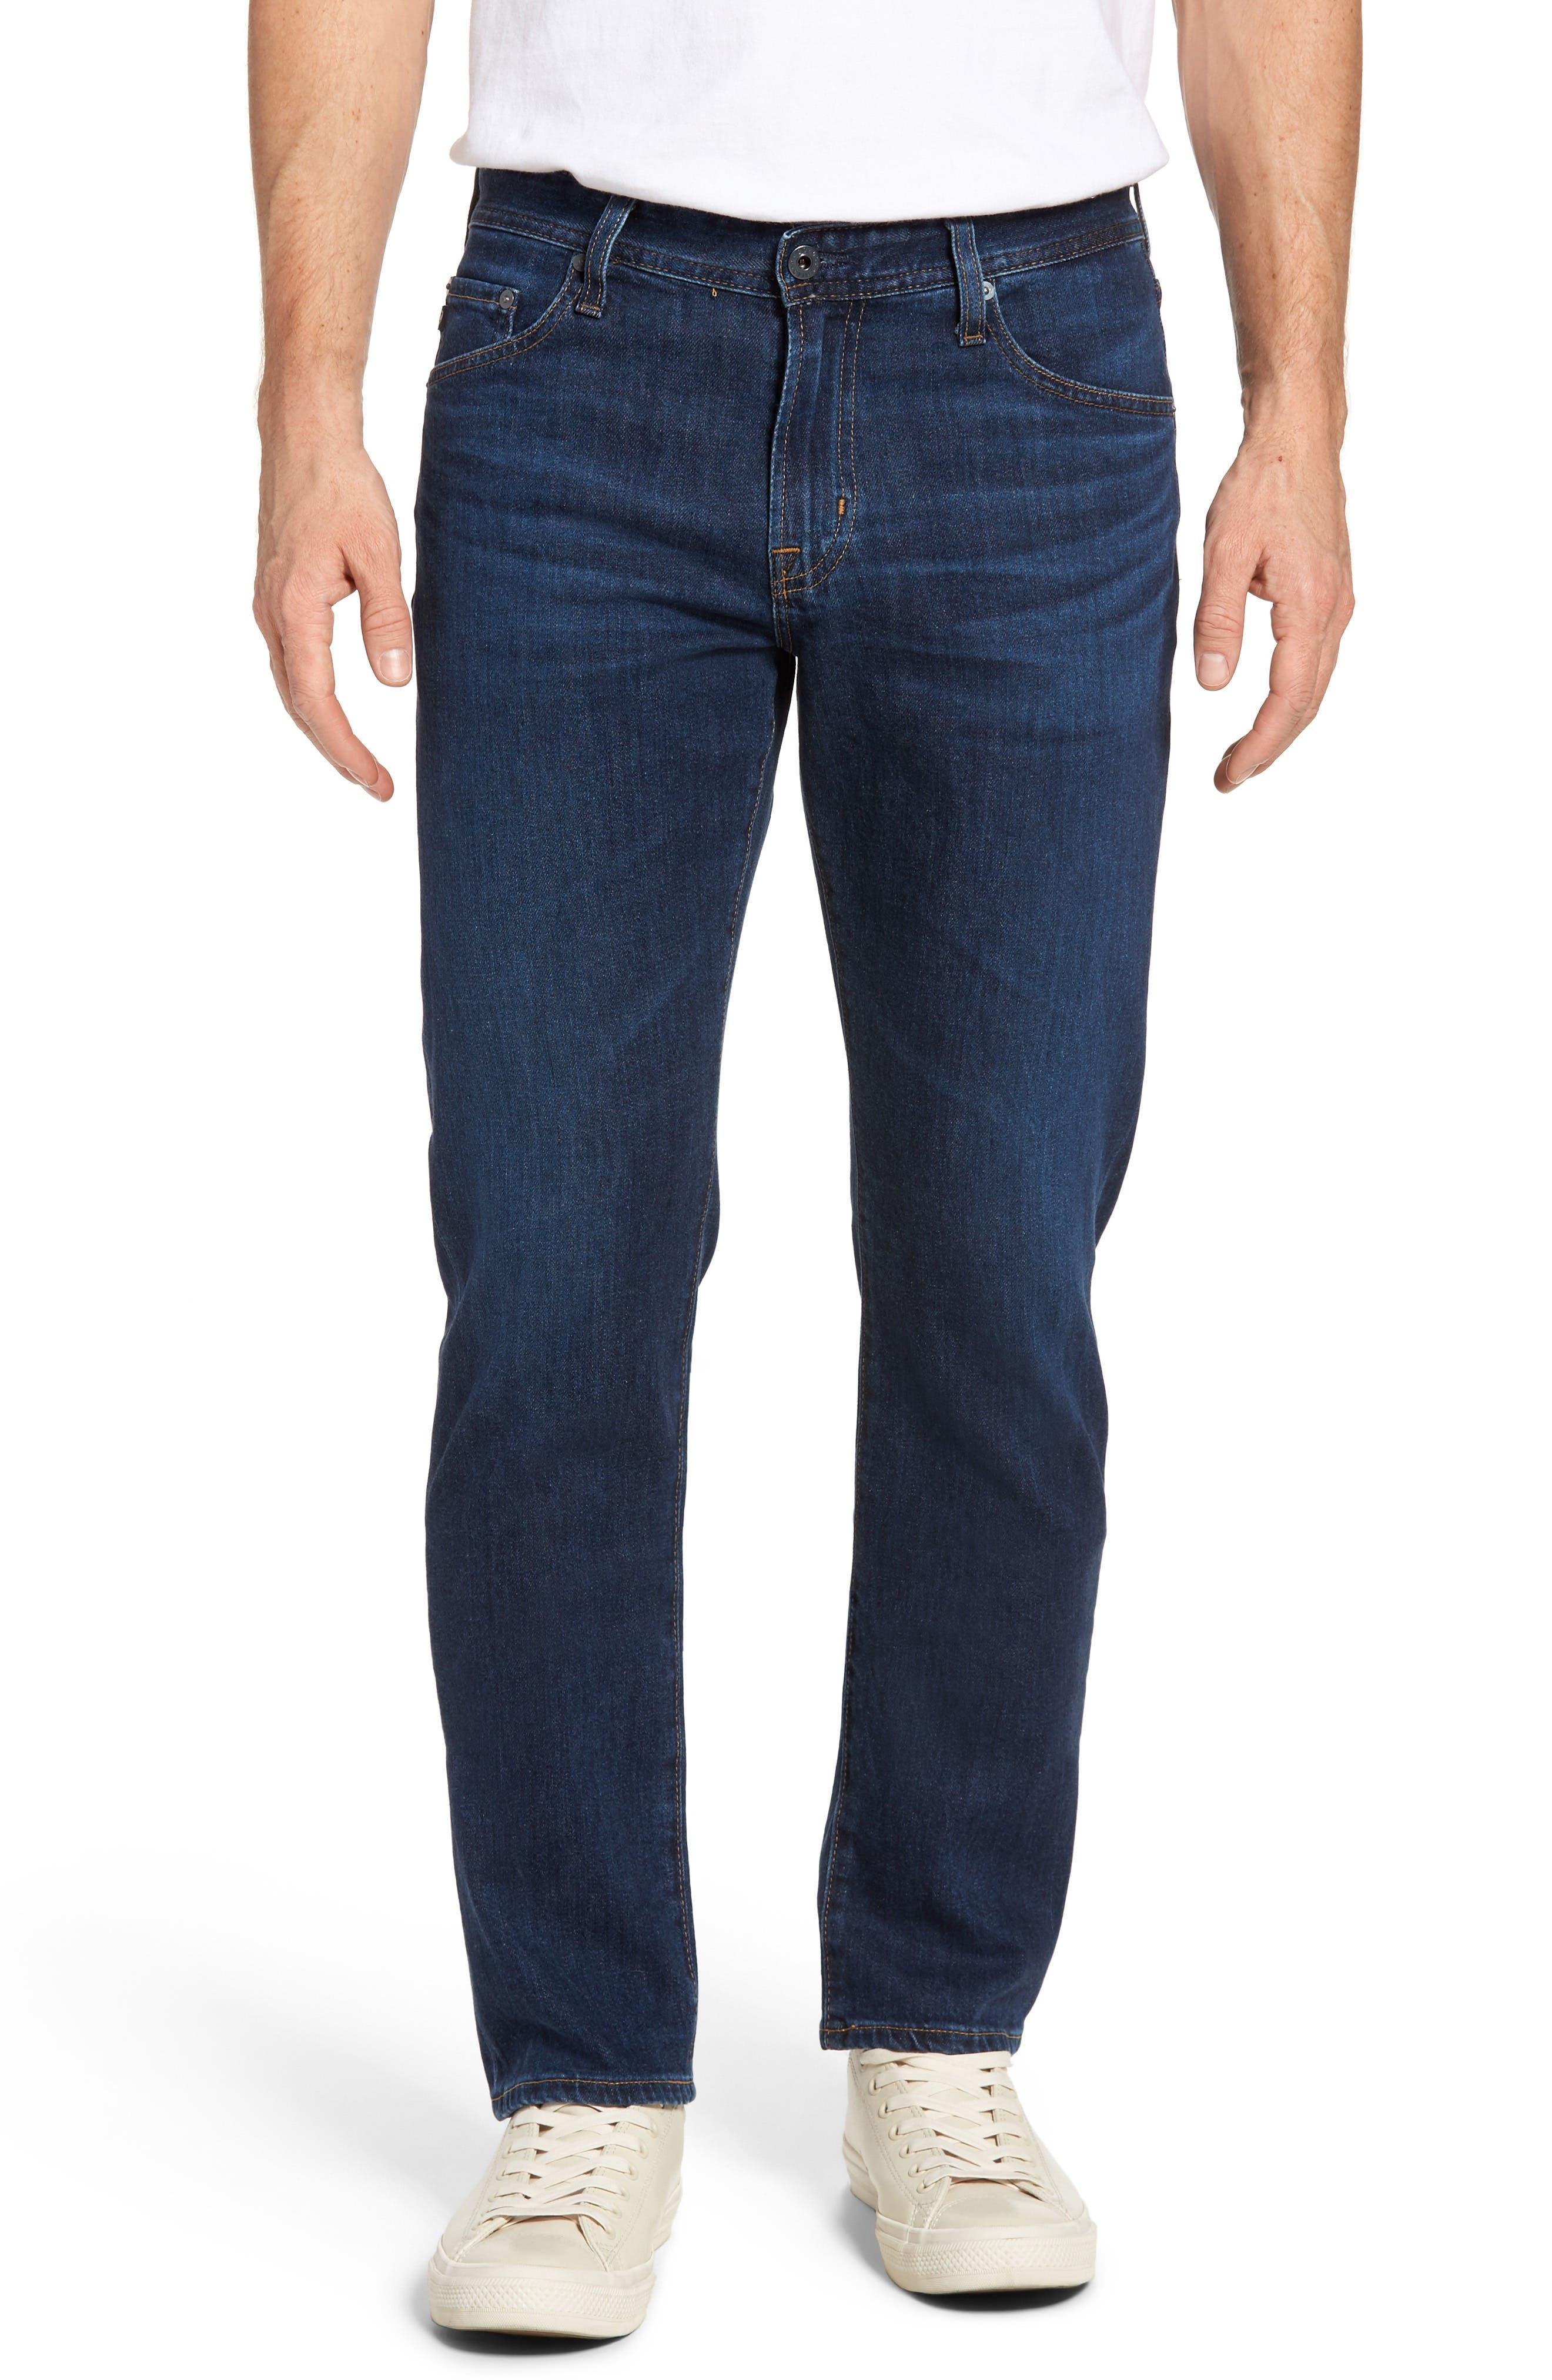 Graduate Slim Straight Leg Jeans,                             Main thumbnail 1, color,                             435